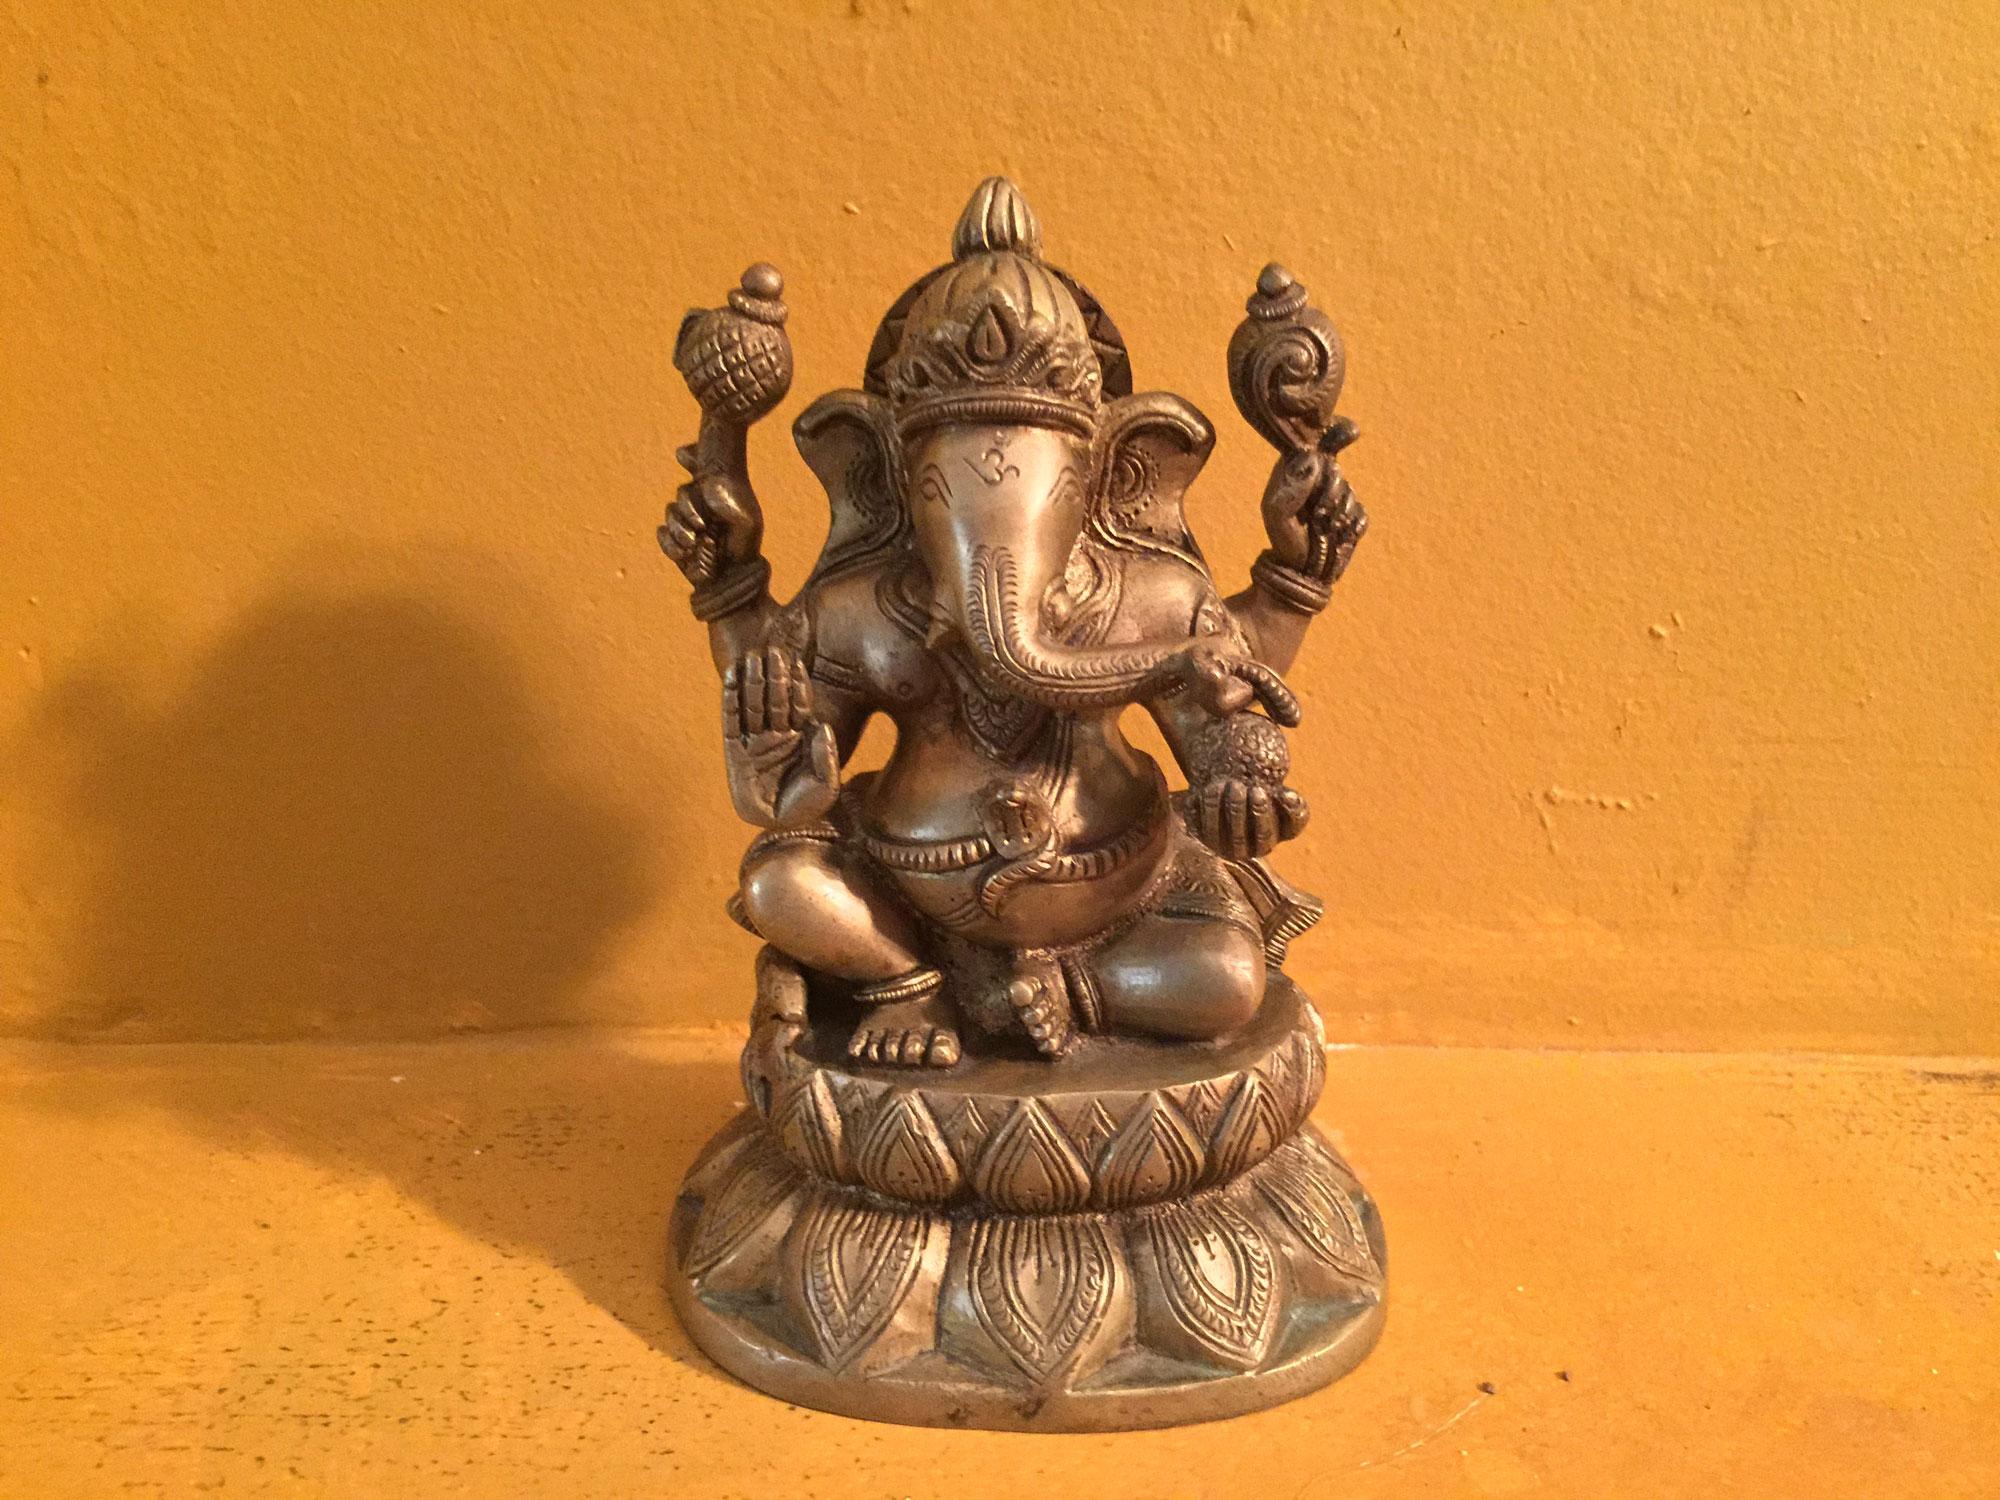 Ganesha, ghostwriter of the  Mahabharata